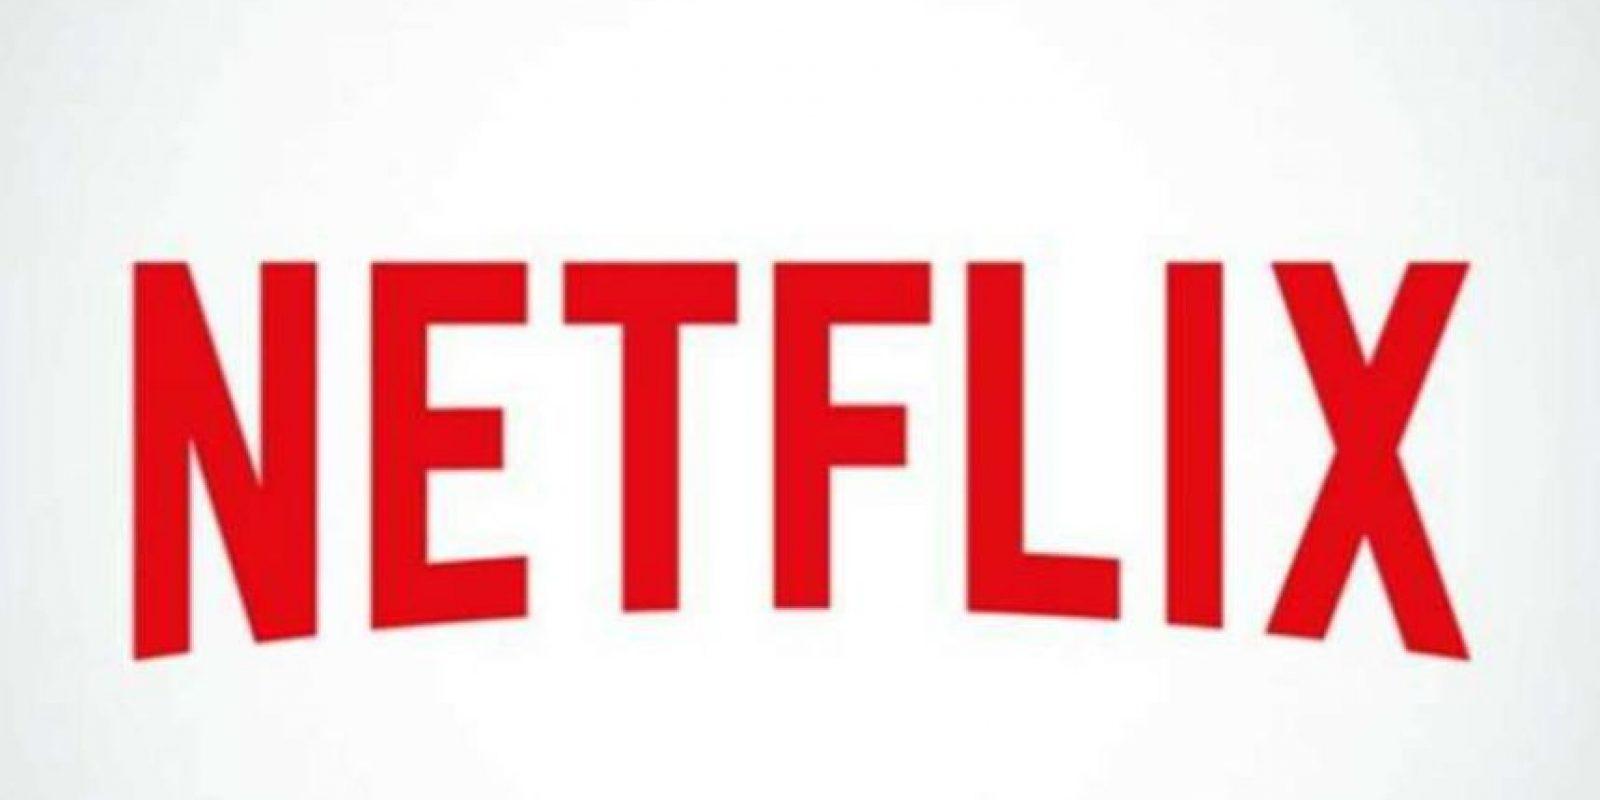 Netflix suele renovar su catálogo mes con mes. Foto:Netflix